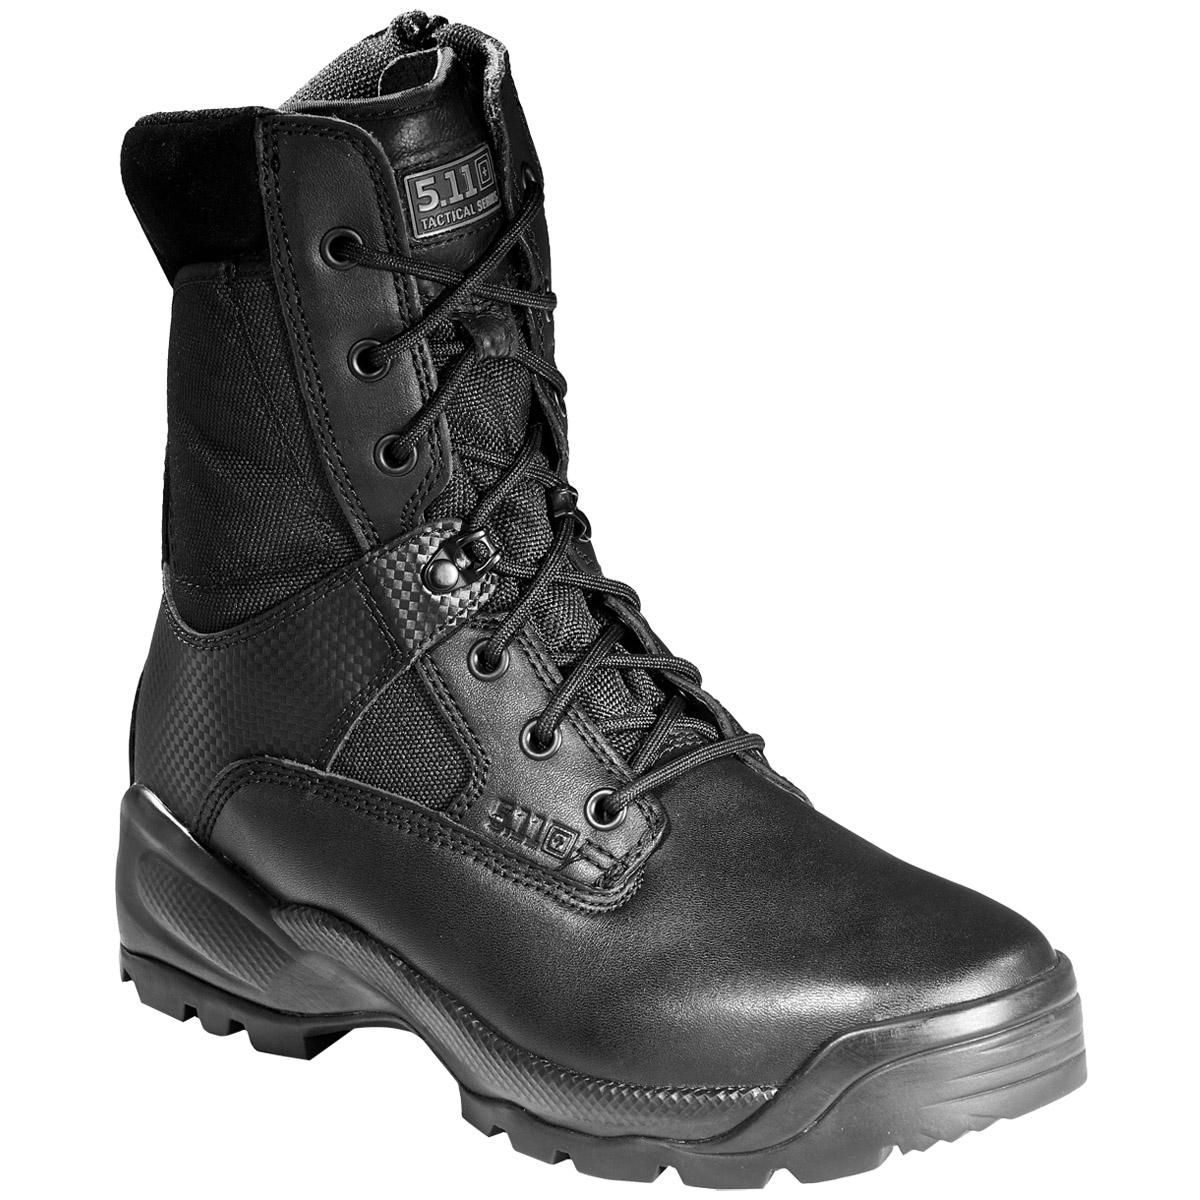 5.11 Tactical ATAC 8u0026quot; Side Zip Mens Boots Patrol Police Security Guard Black | EBay